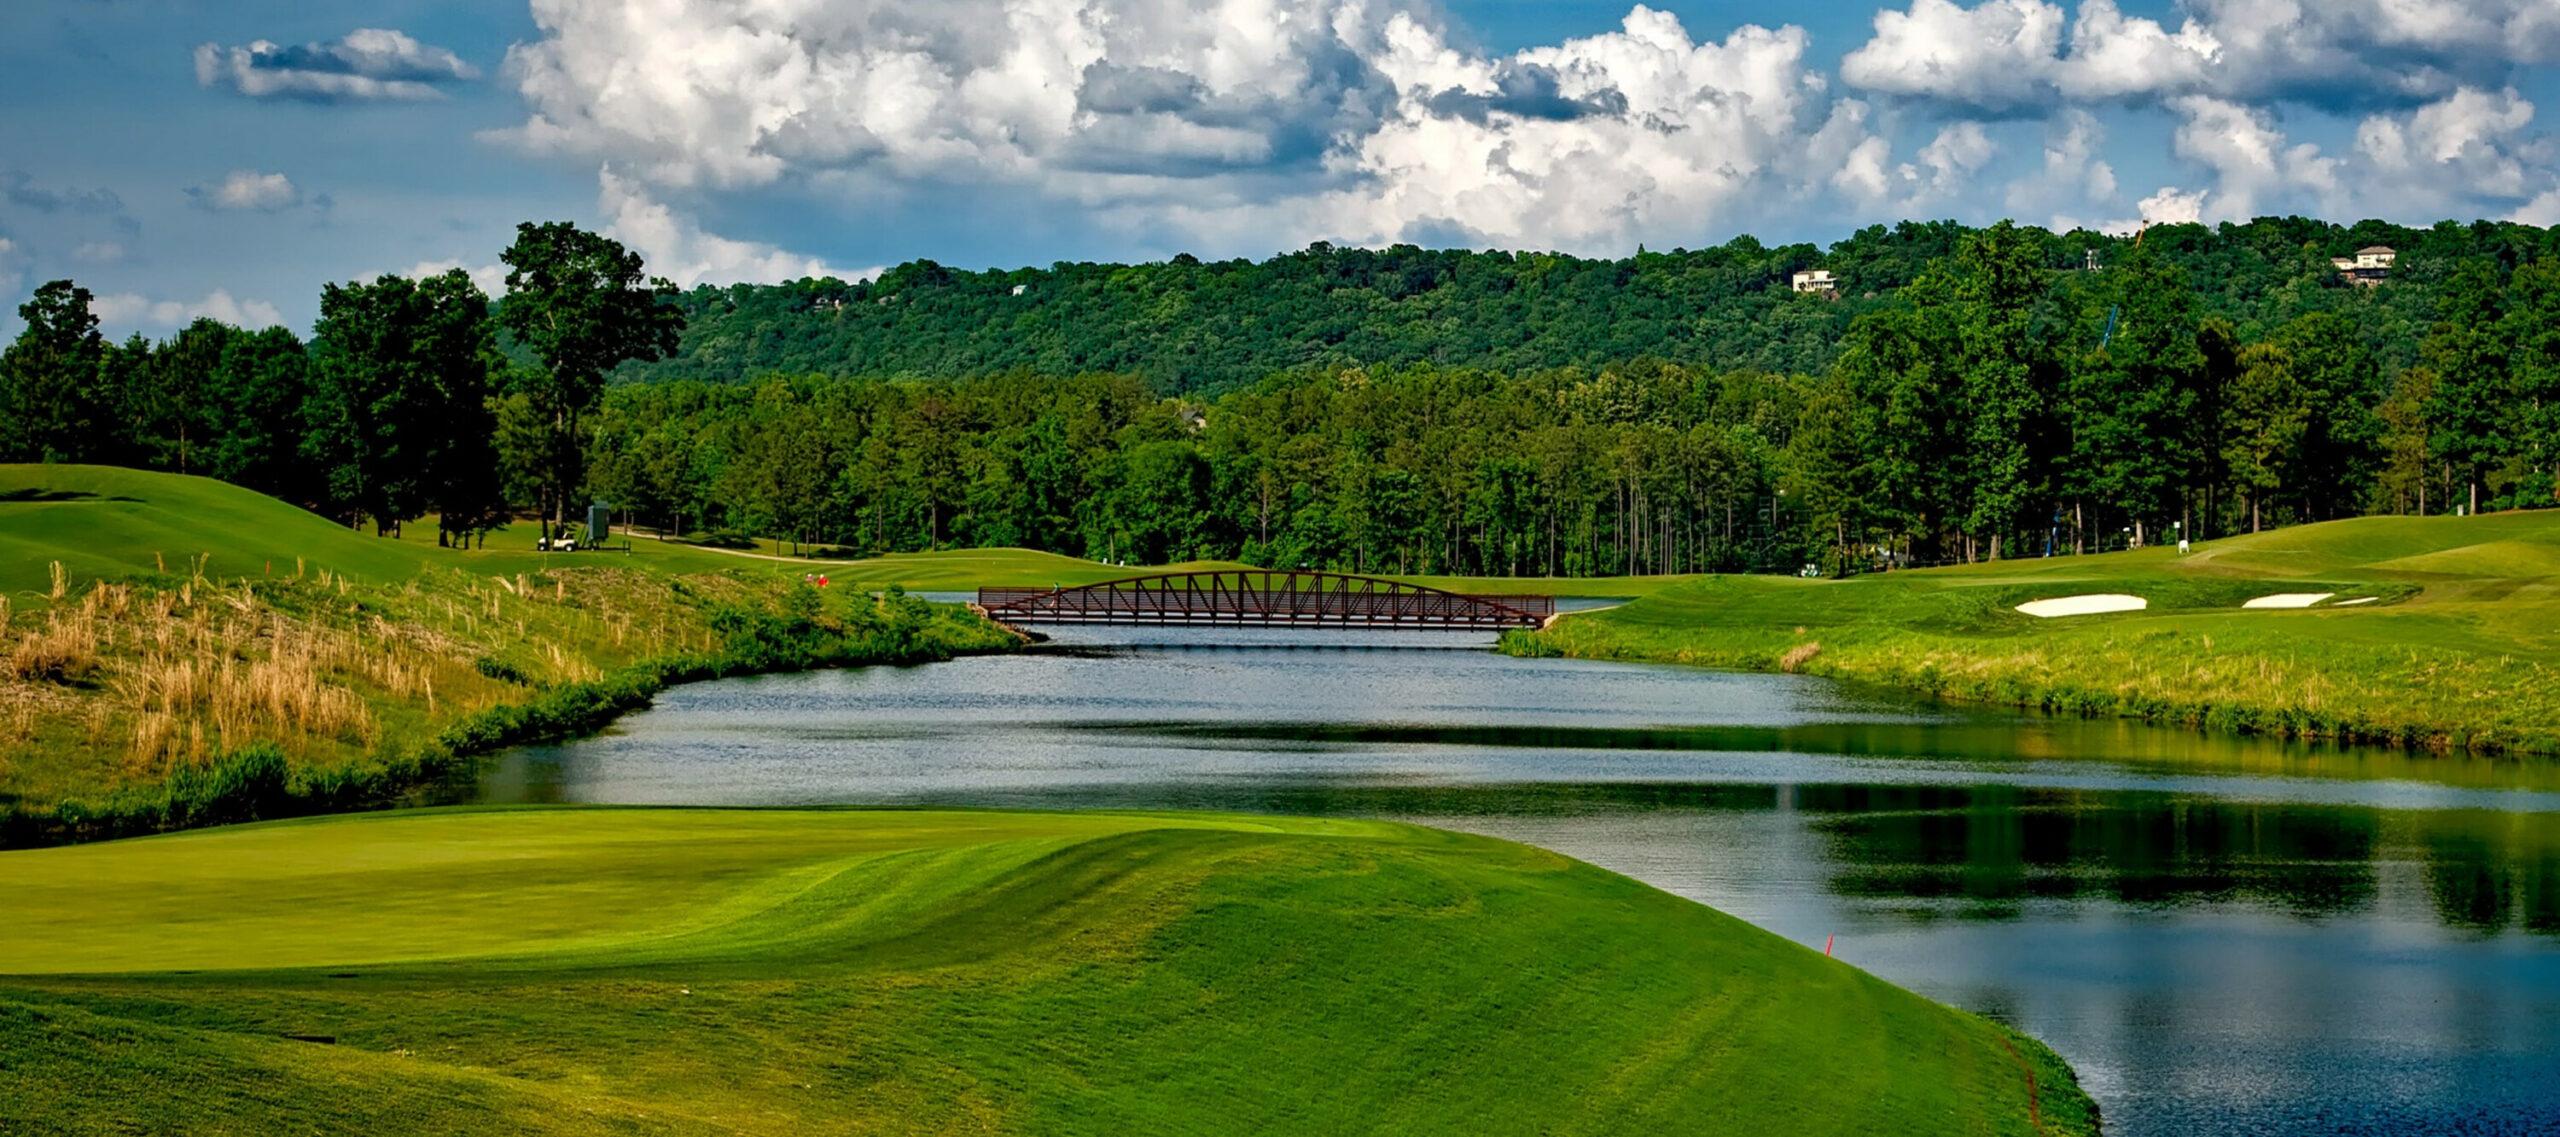 Prachtige-filmset-golfbaan